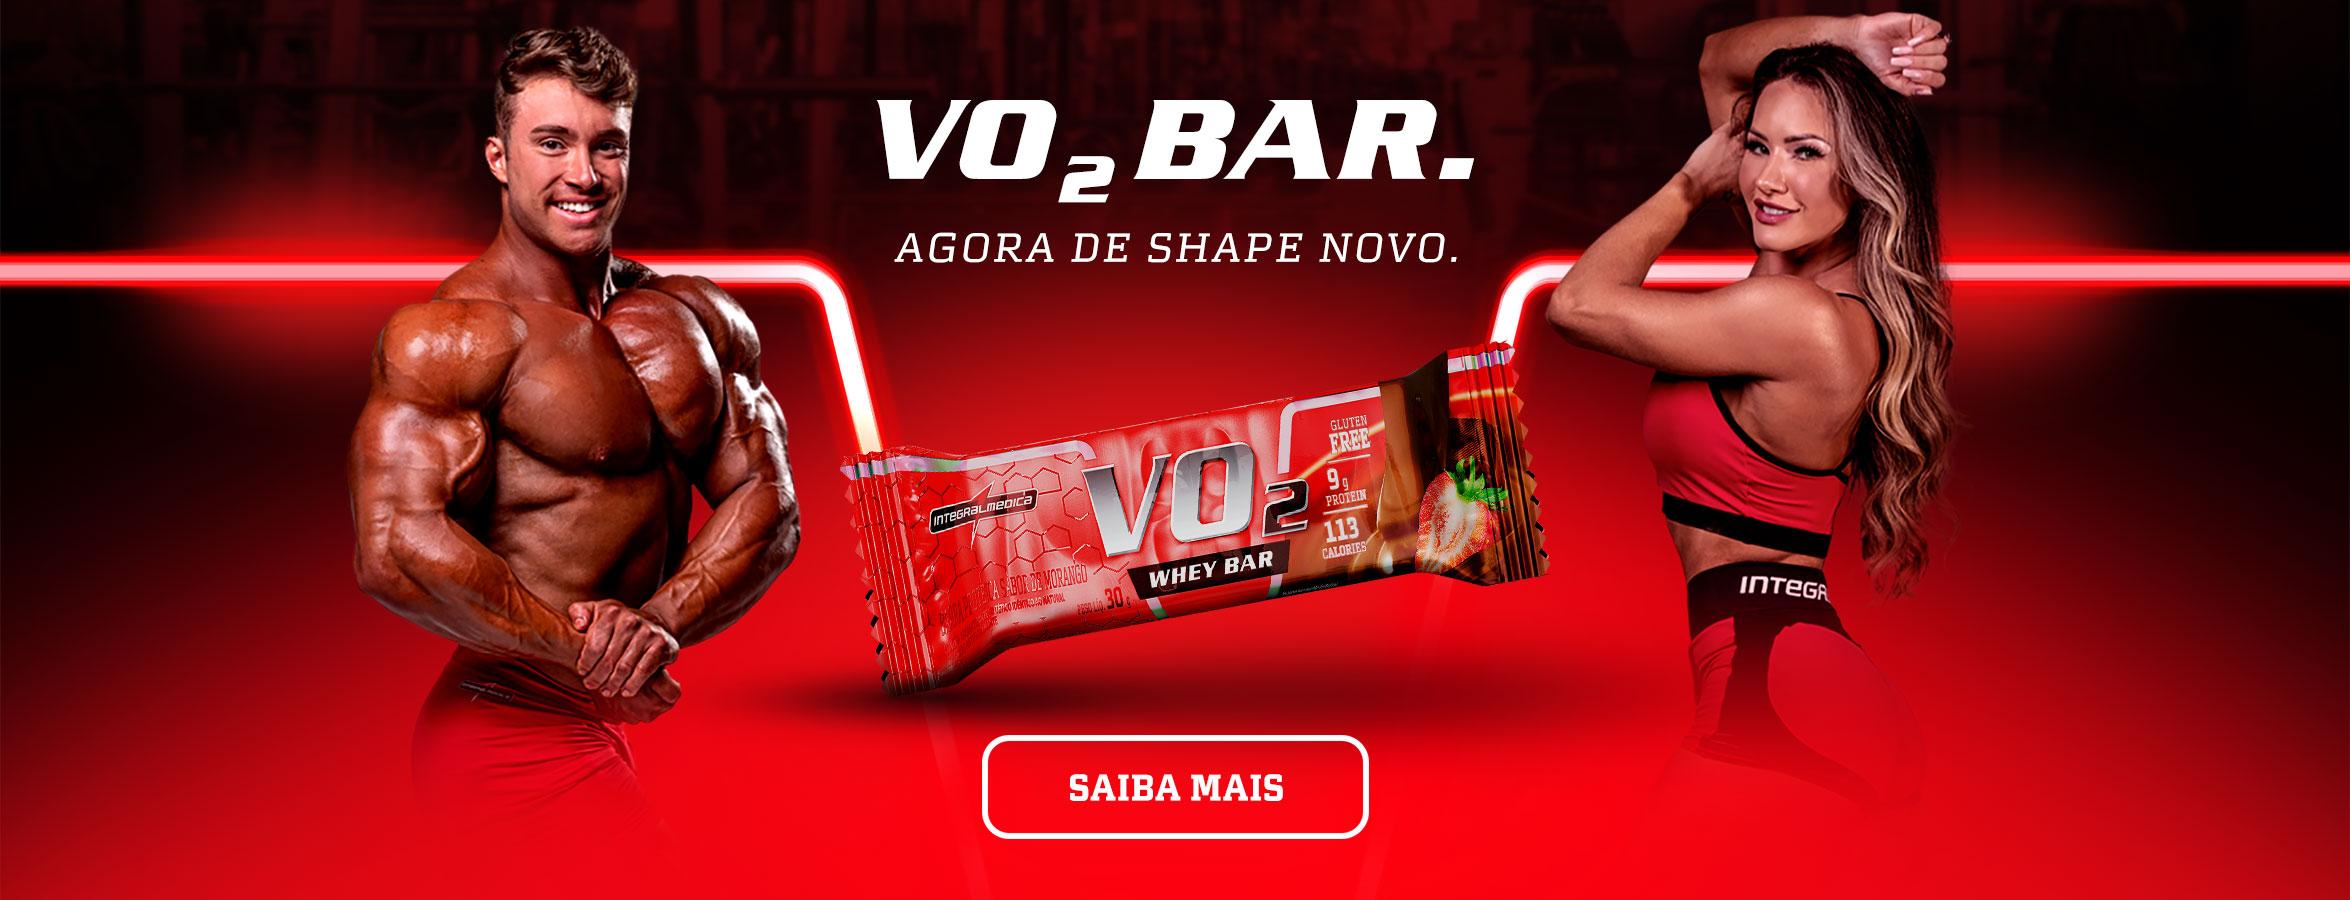 Vo2 Bar